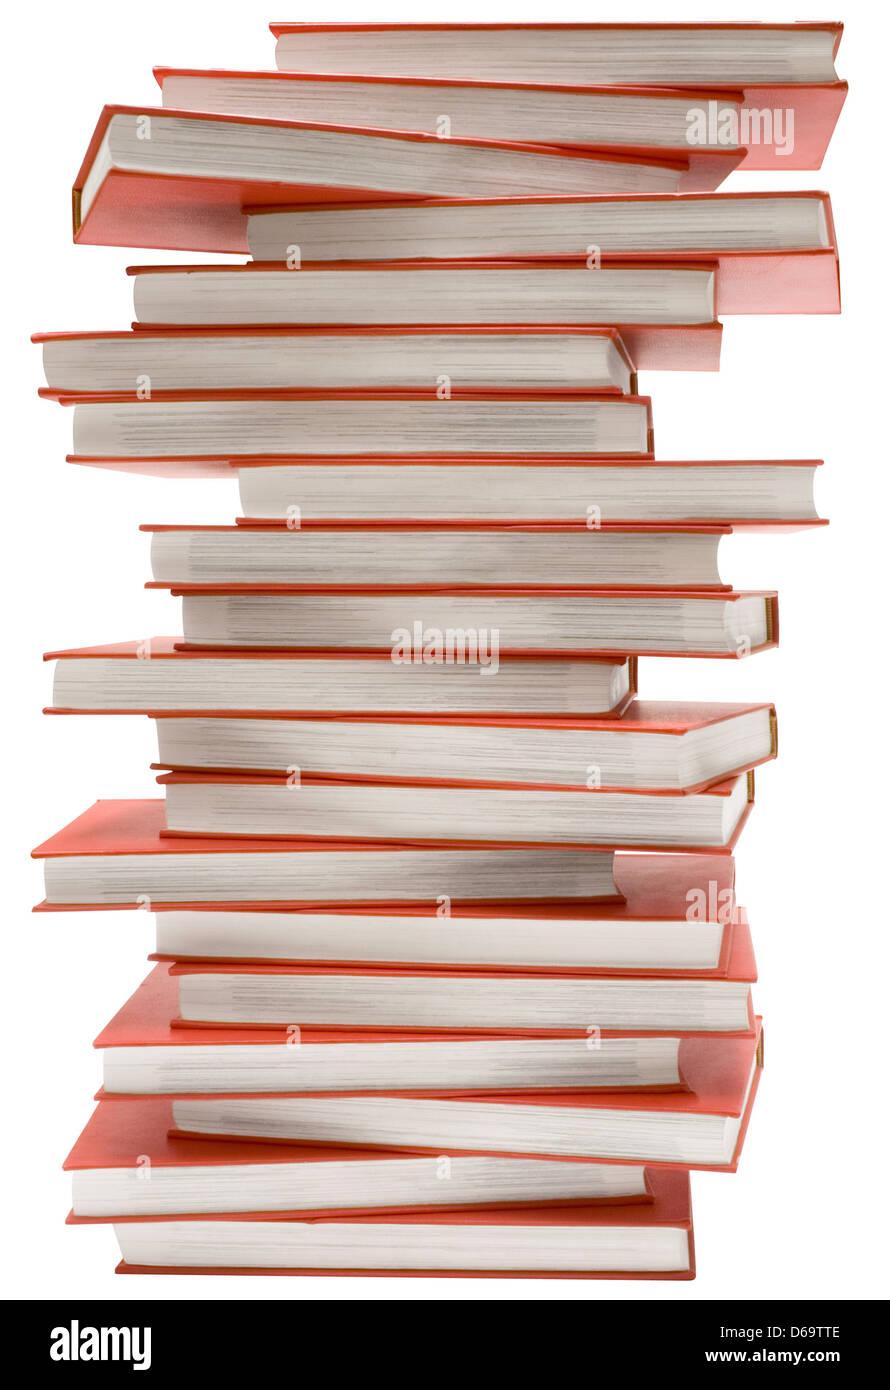 stacking books,encyclopedia stock photo, royalty free image